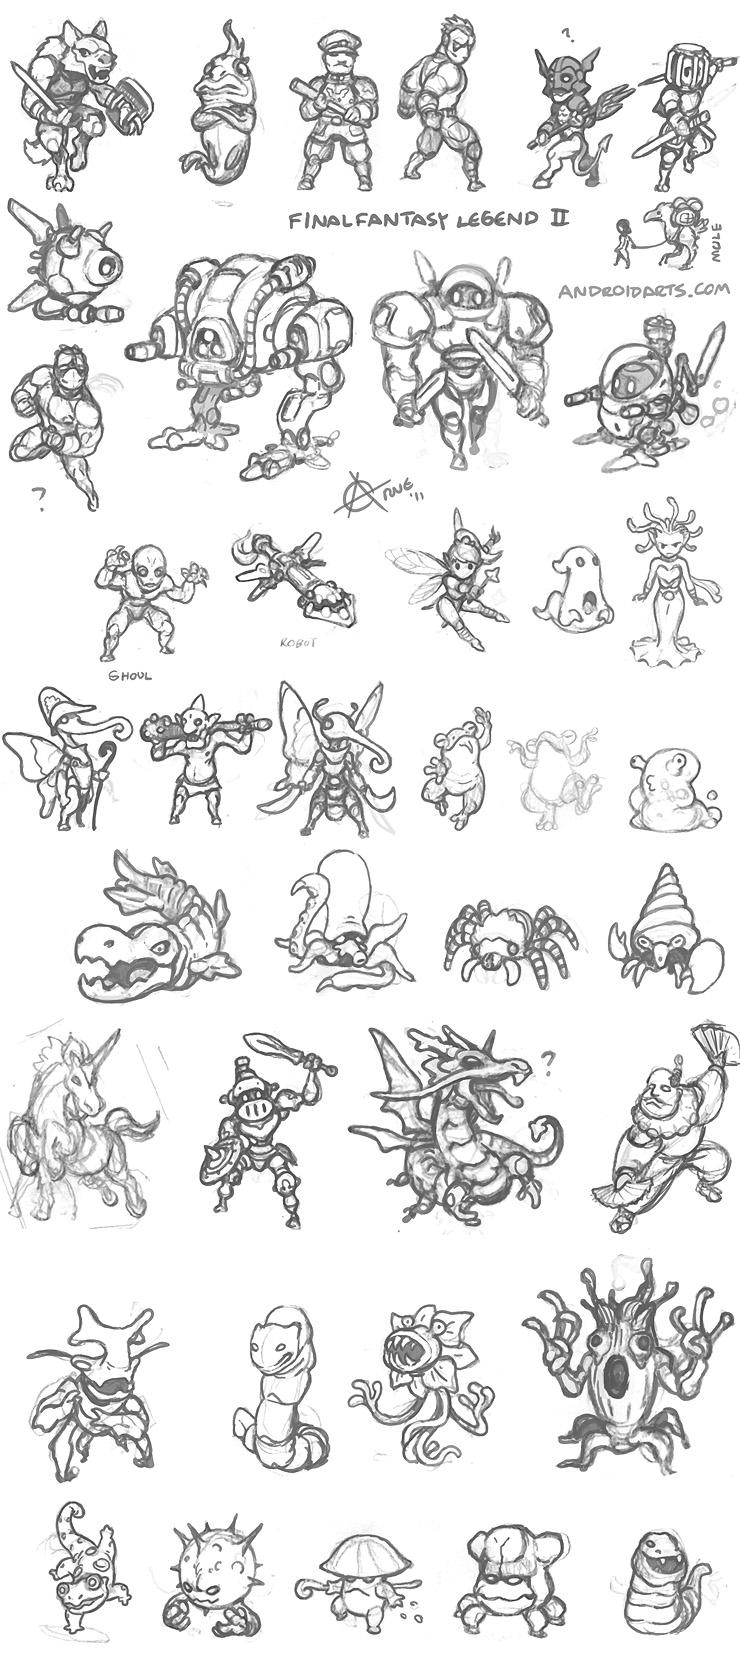 Arne - Retro gaming, concept art and ideas